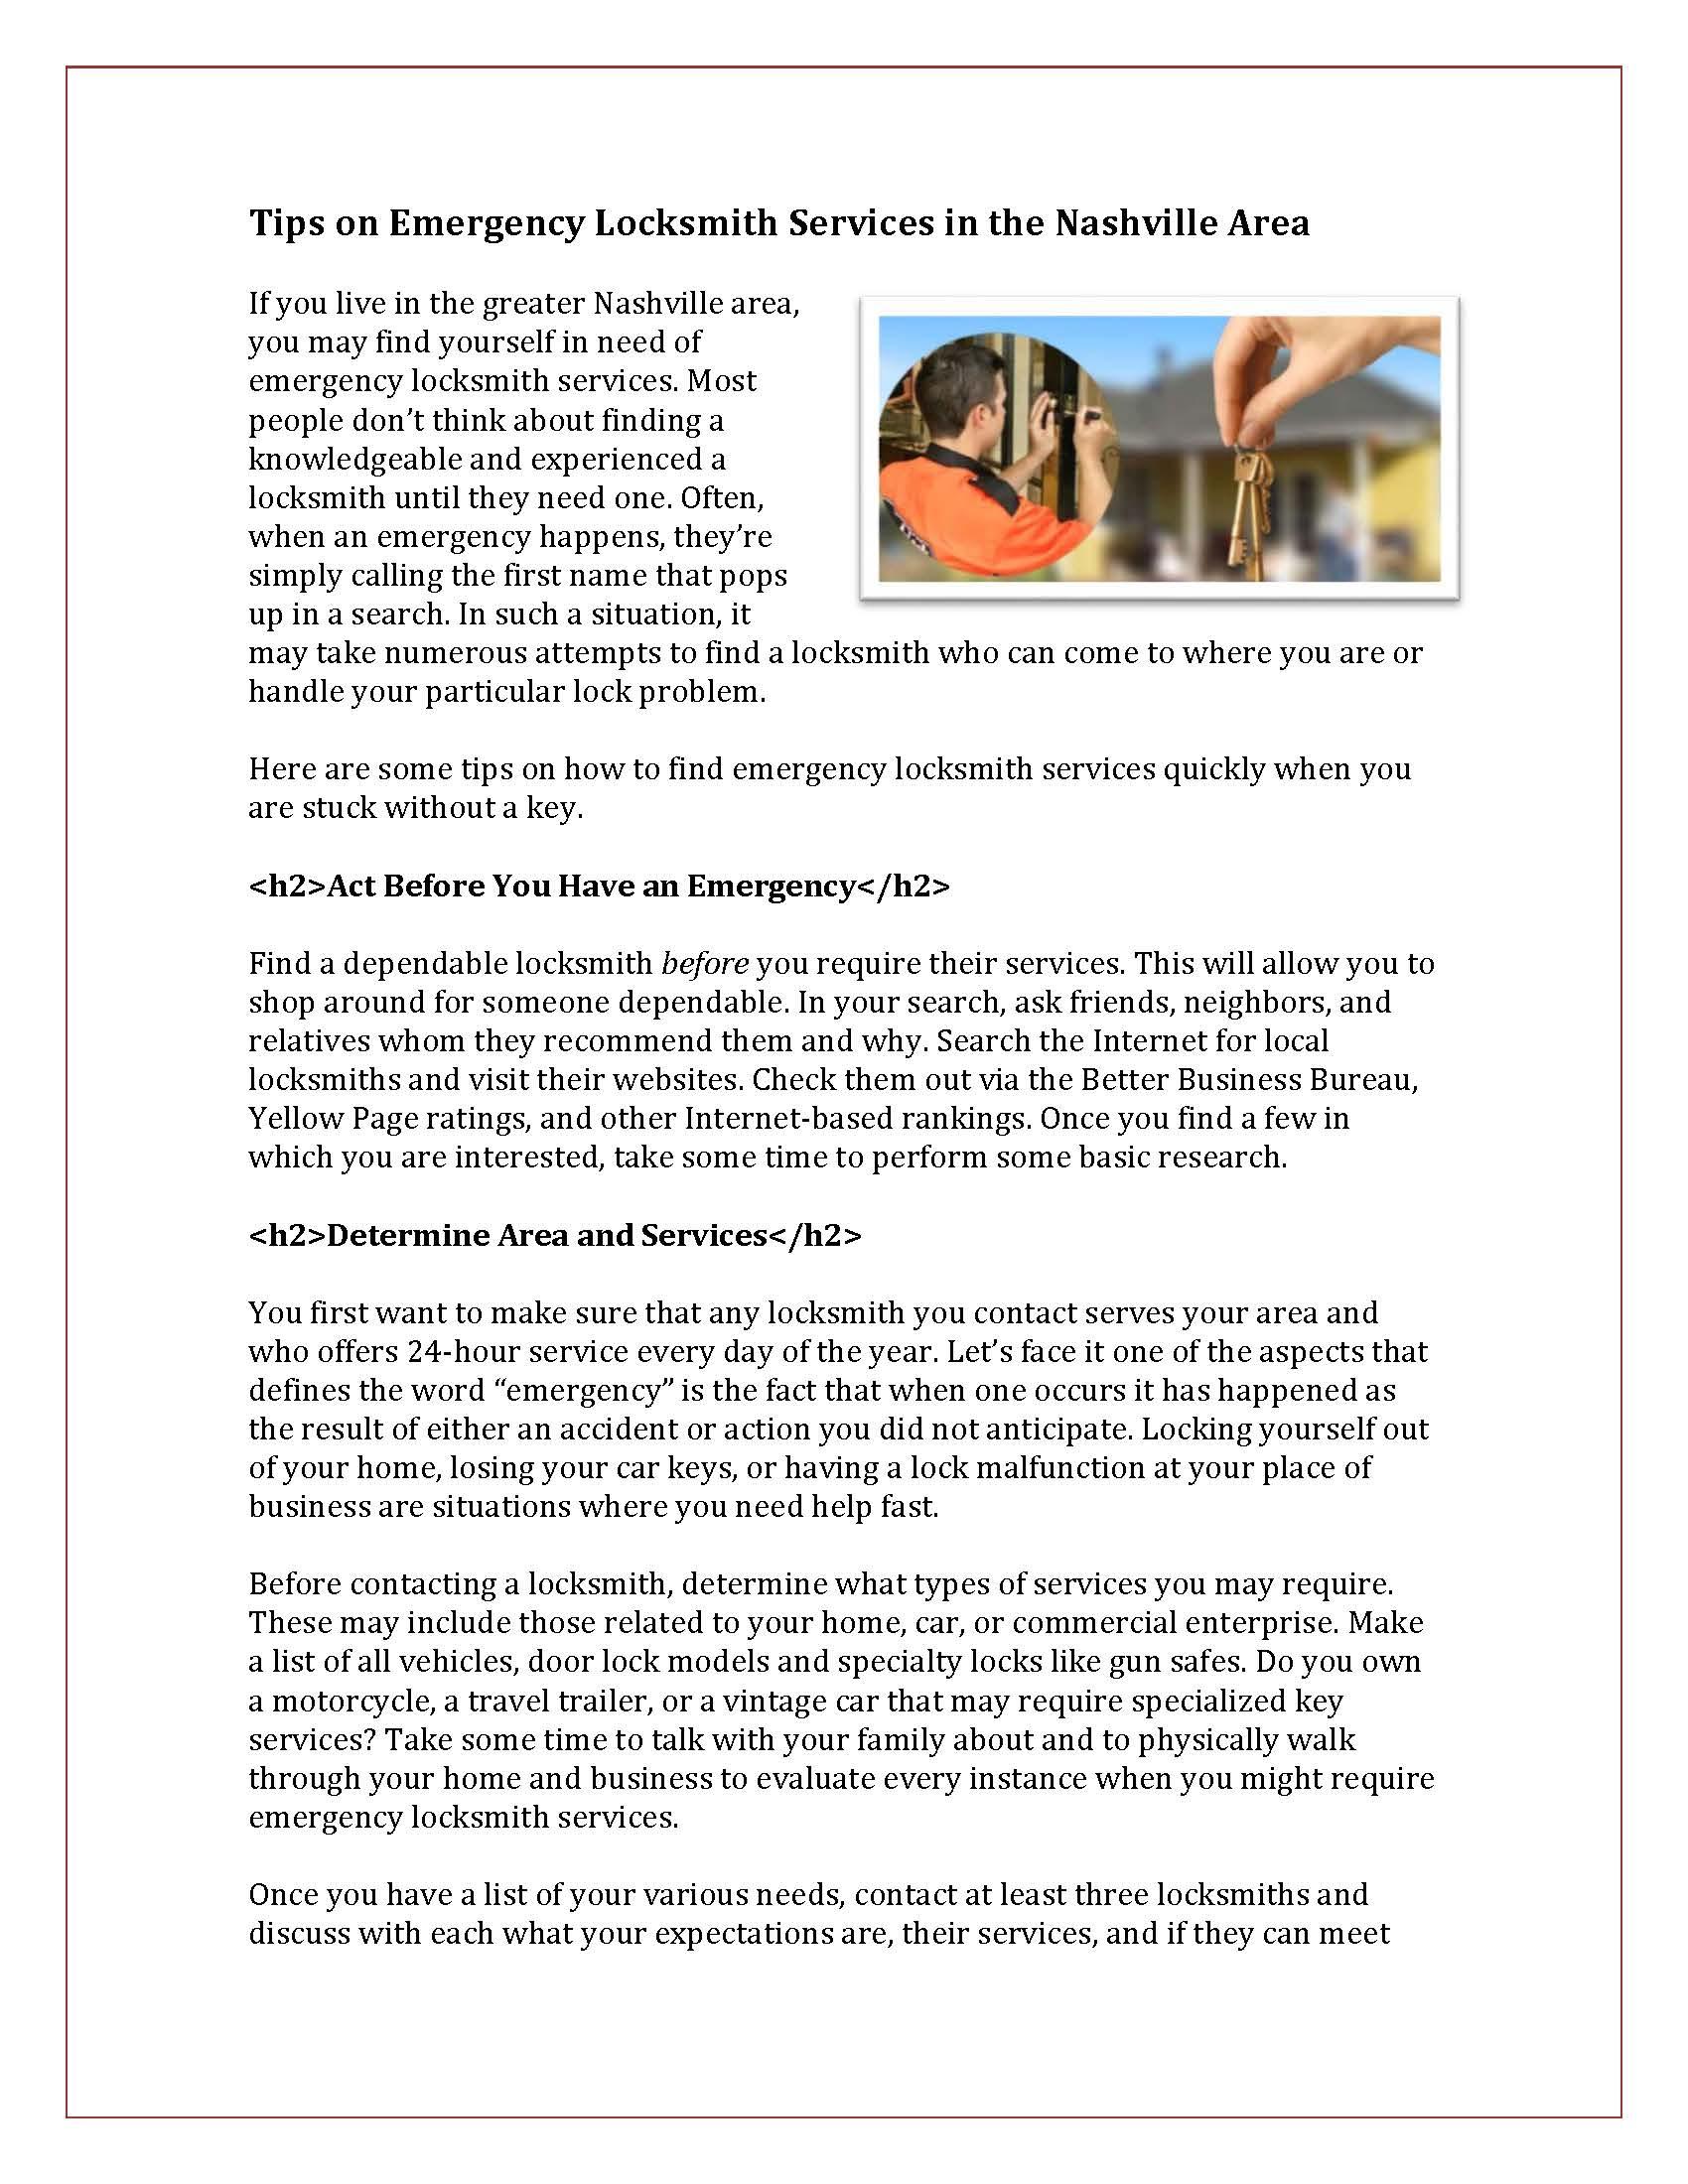 SEO Tips on Emergency Locksmith Services Nashville_Page_1